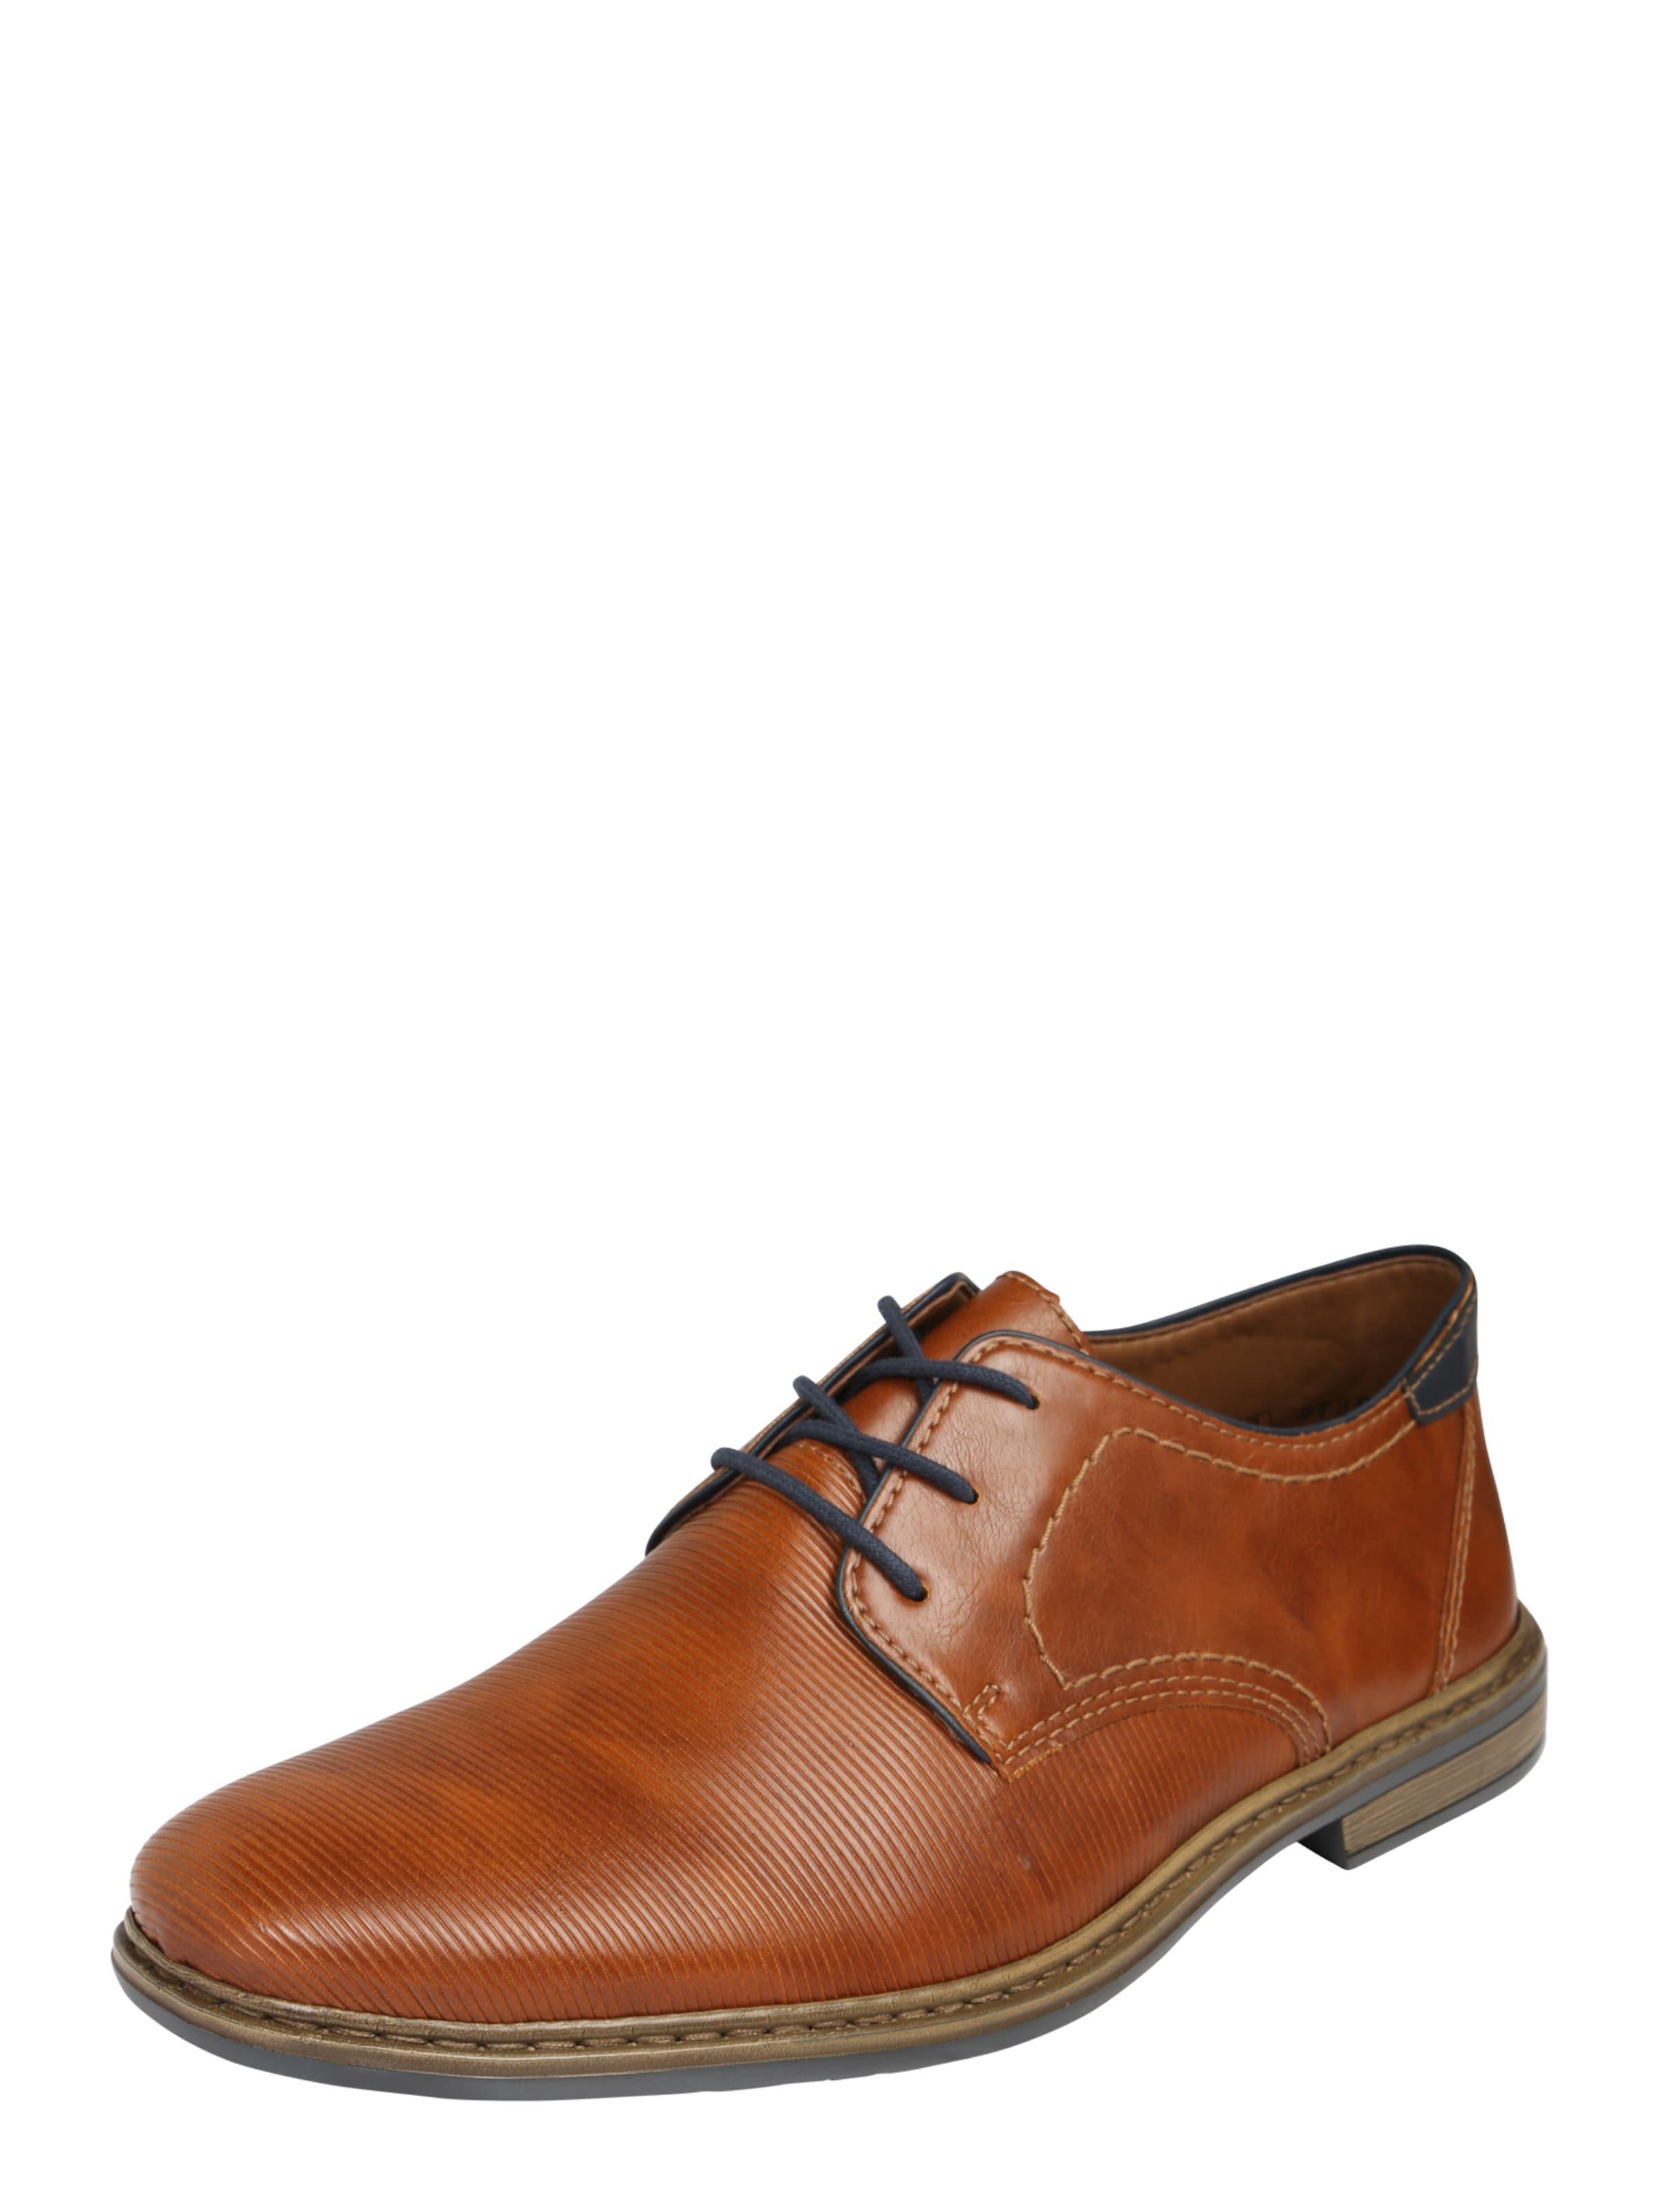 RIEKER Schnürschuh aus Schuhe Kunstleder Verschleißfeste billige Schuhe aus e4aac7